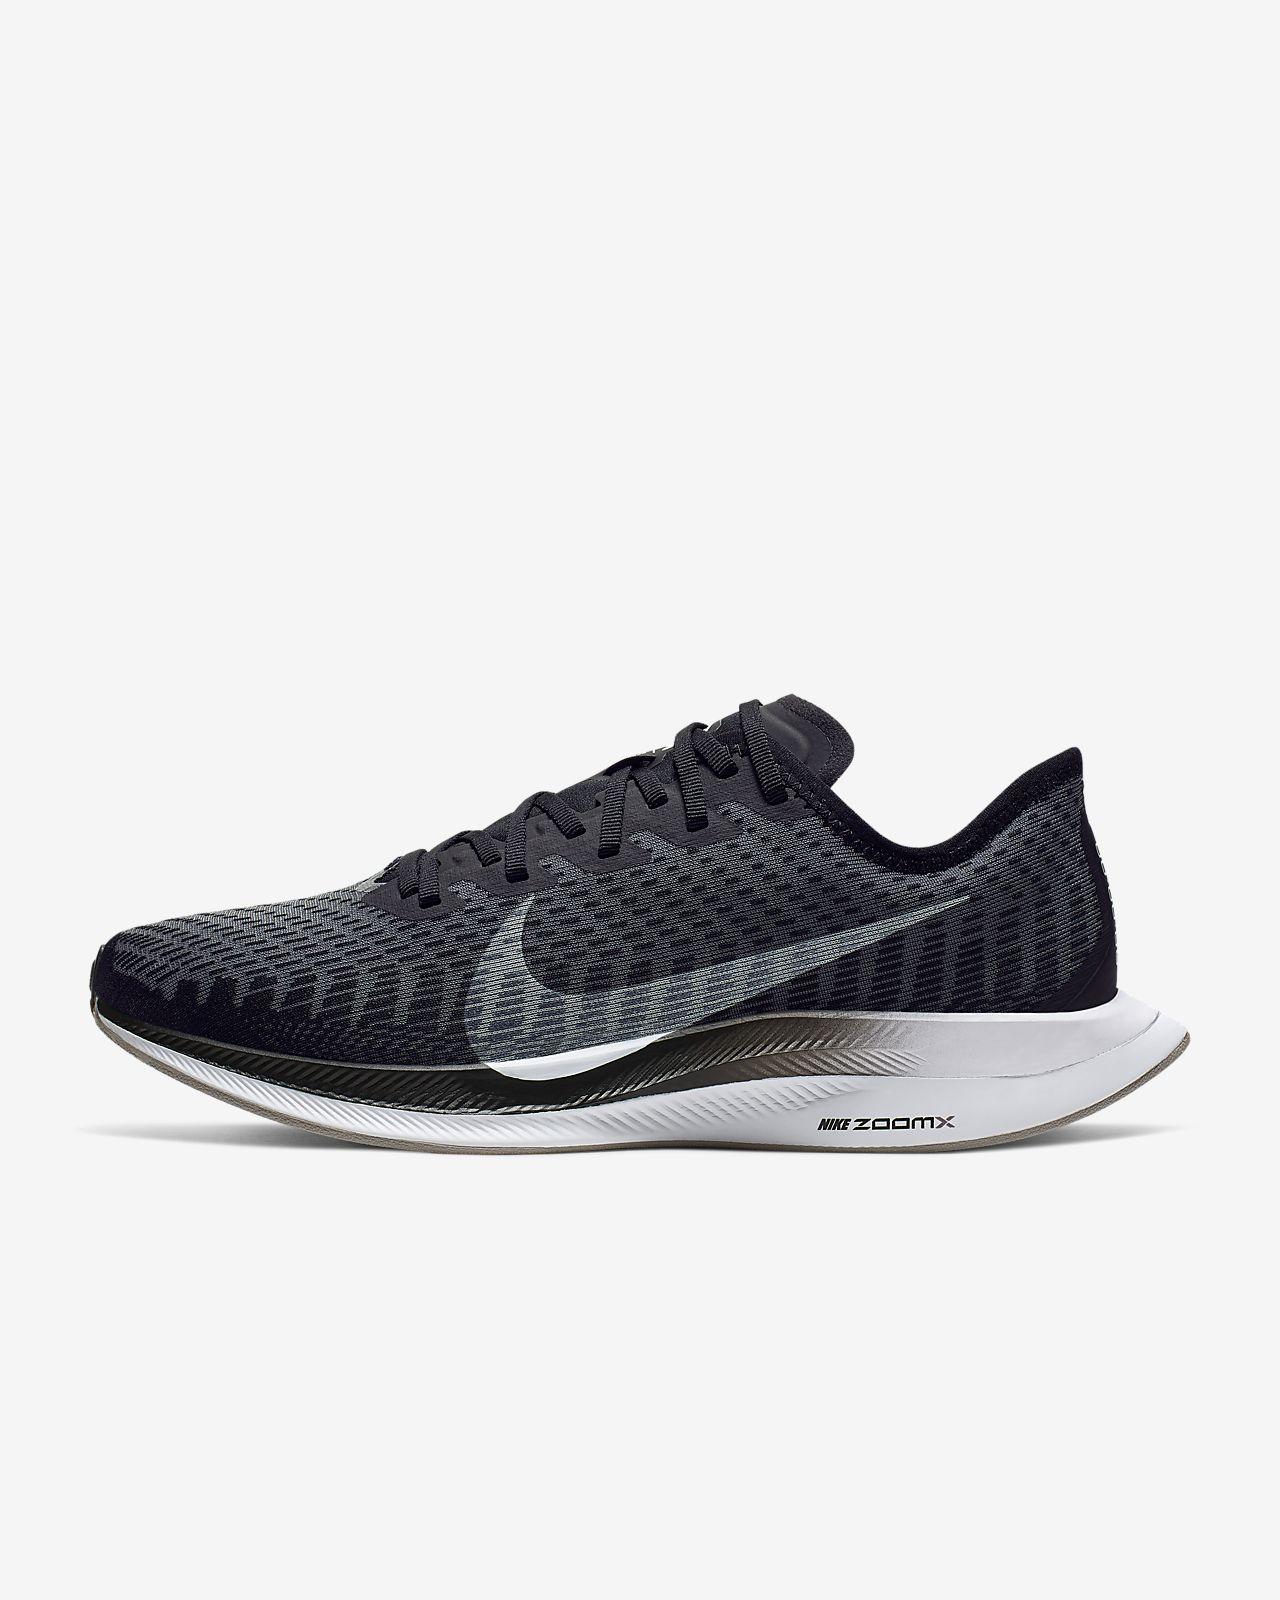 Nike Zoom Pegasus Turbo 2 Kadın Koşu Ayakkabısı